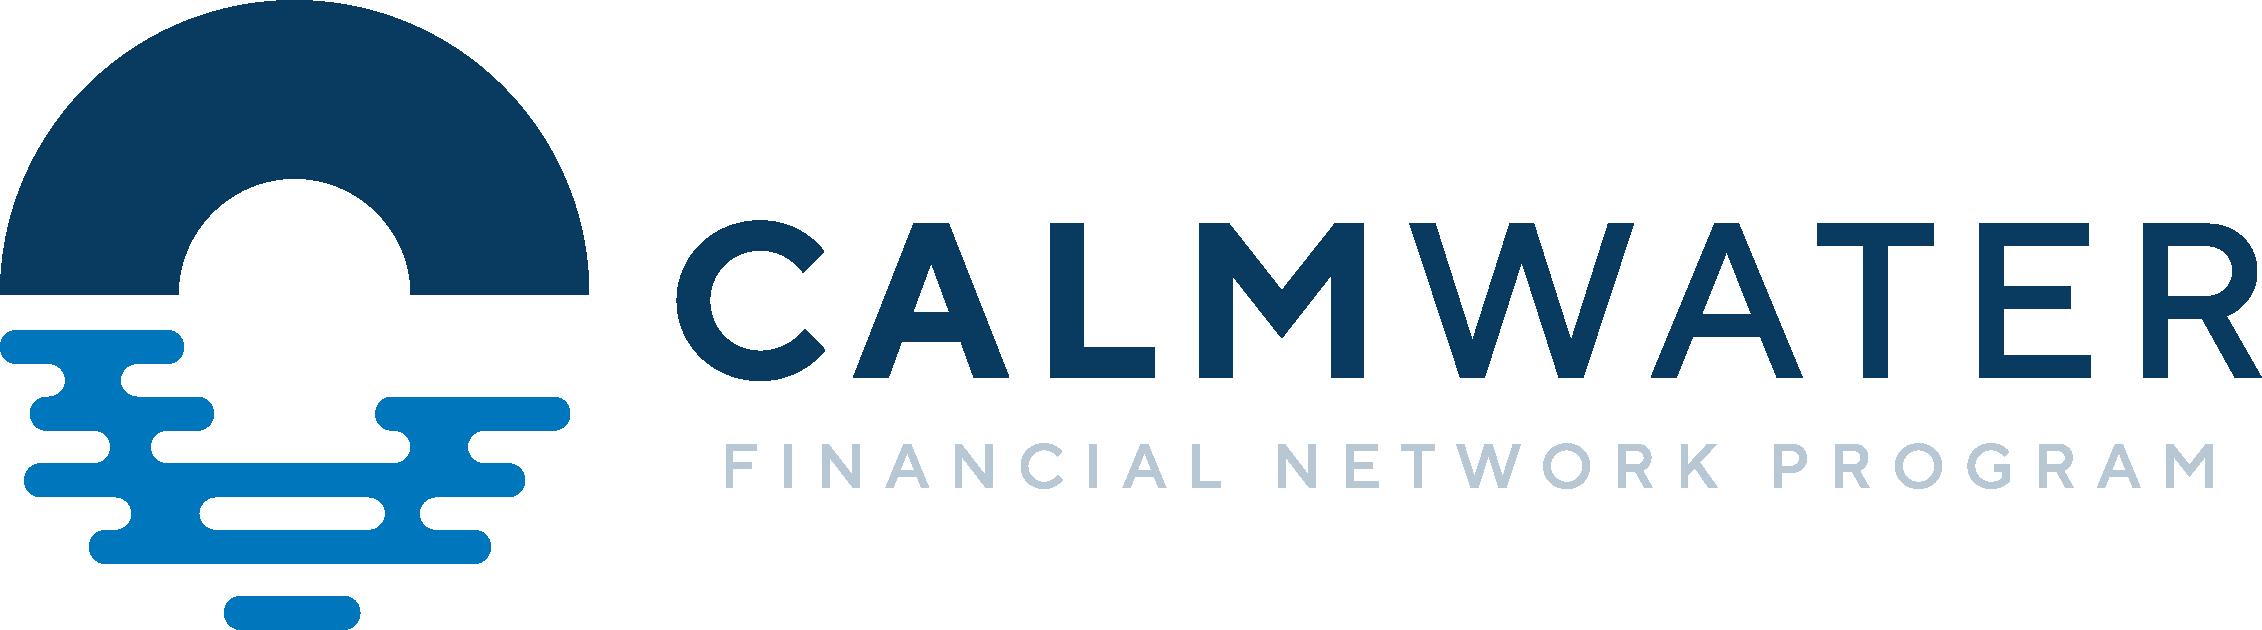 CalmWater Financial